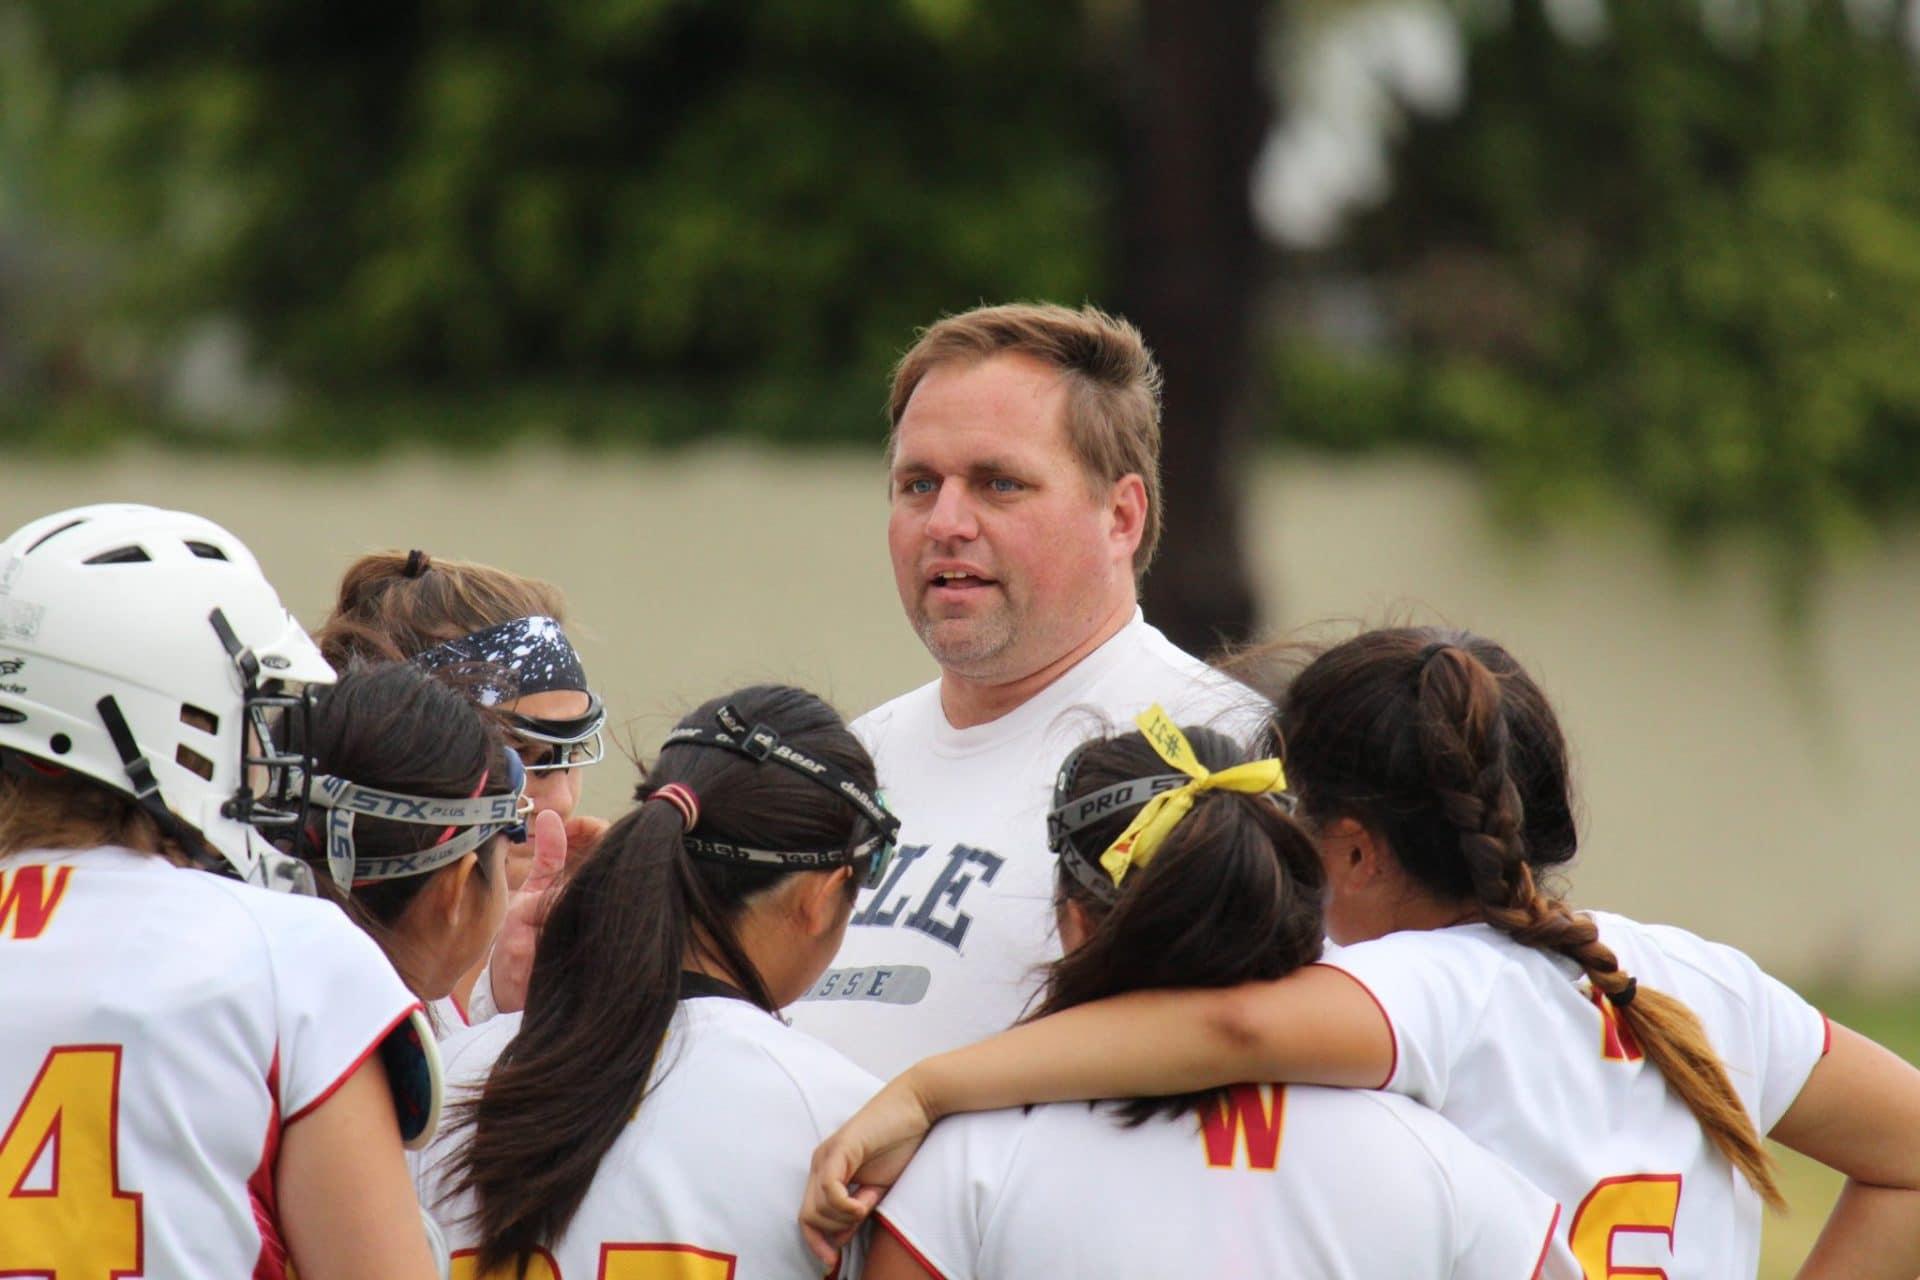 Grant Davis, Woodbridge girls lacrosse